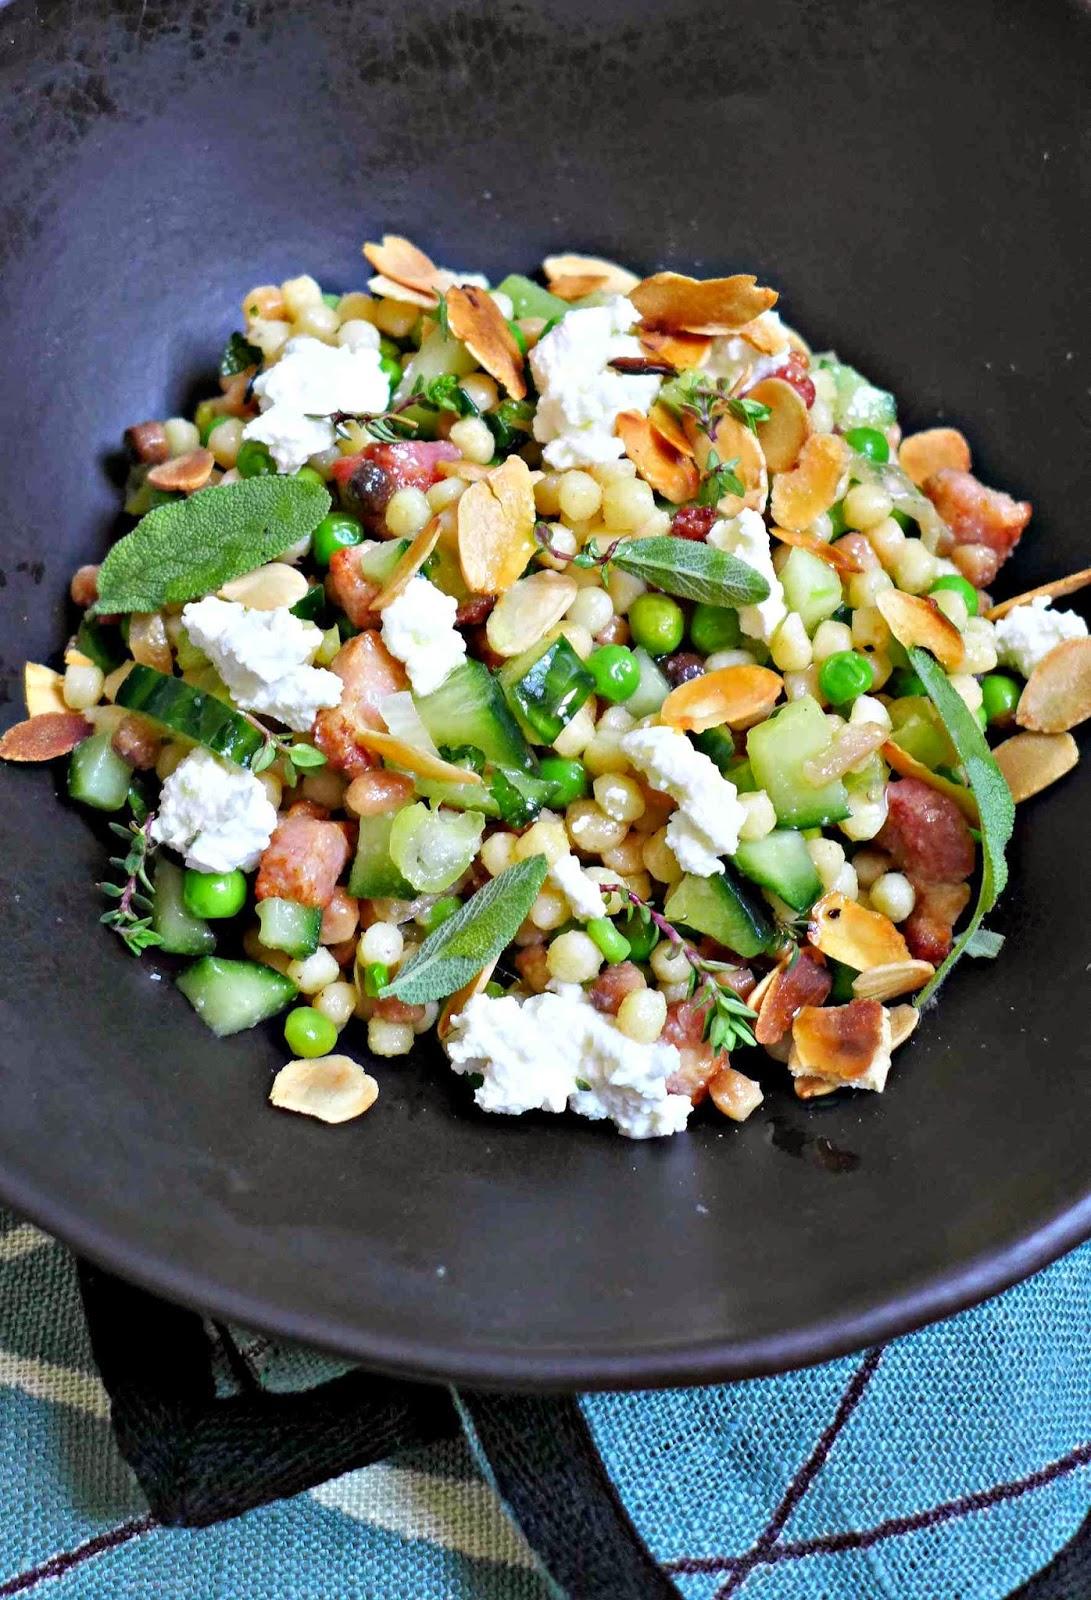 Salade de fregola sarda petits pois et citron confit - Salade originale ete ...